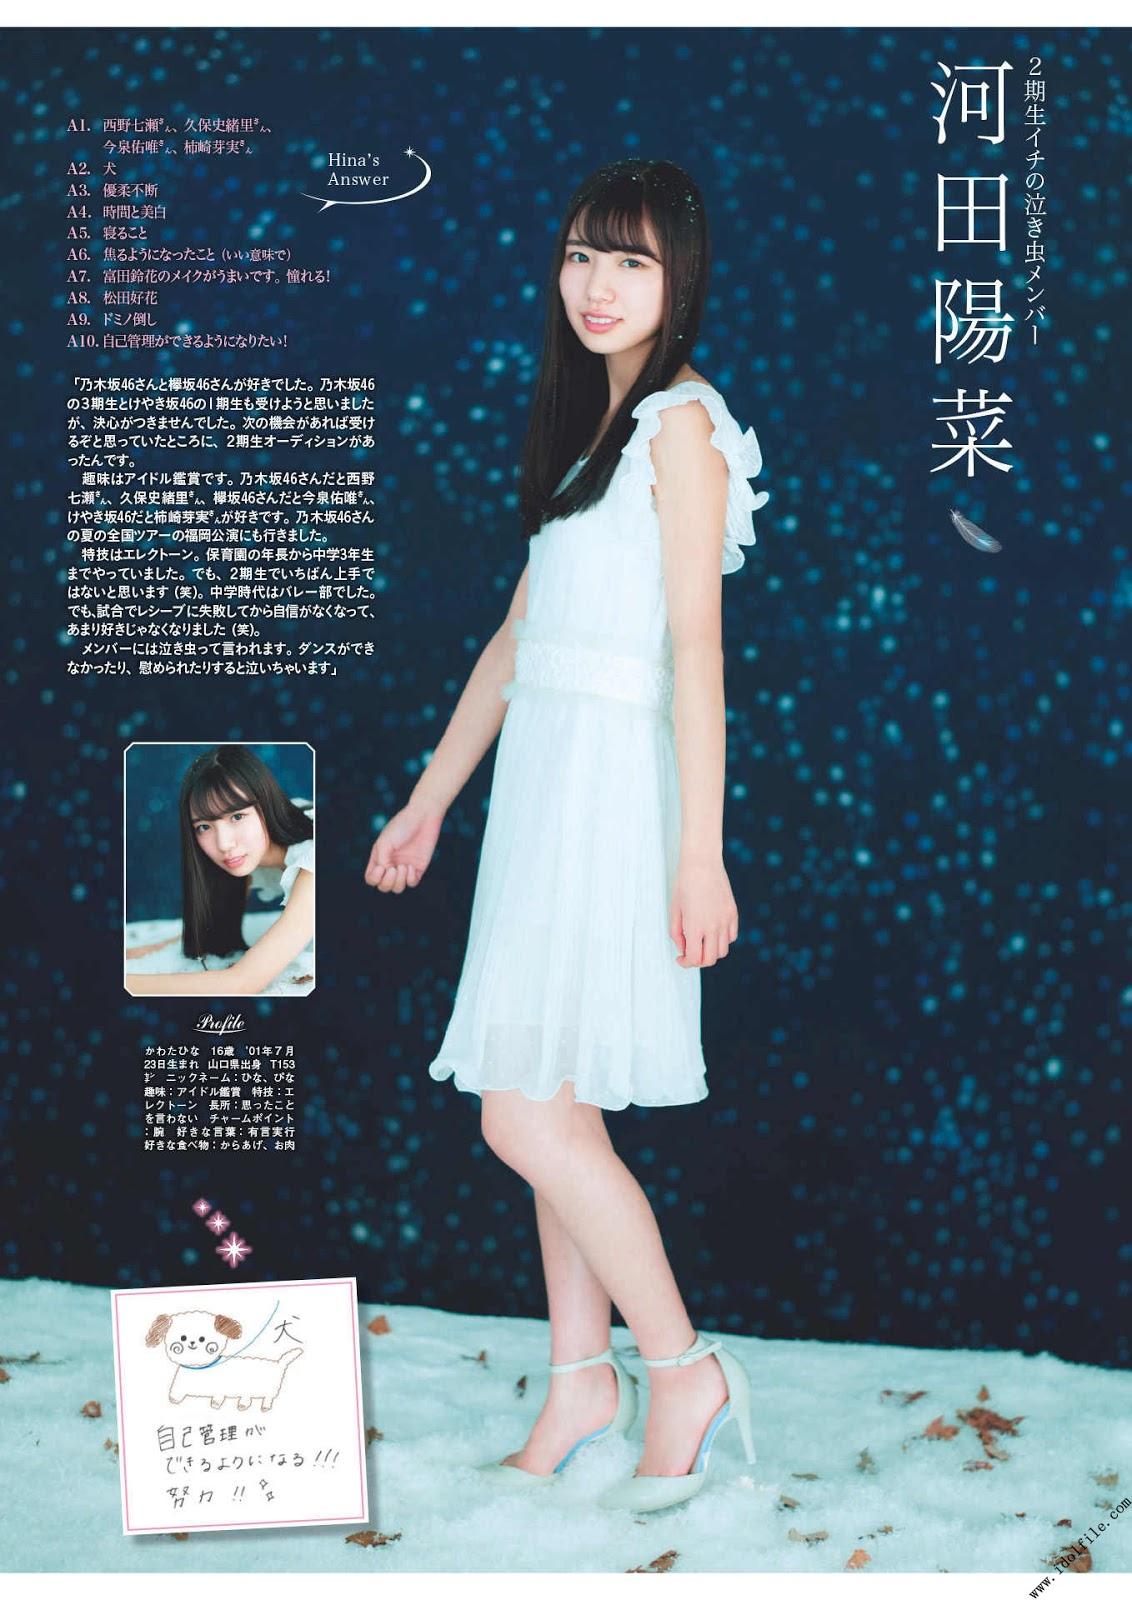 Hiragana Keyakizaka46, FLASHスペシャルグラビアBEST 2018新春号